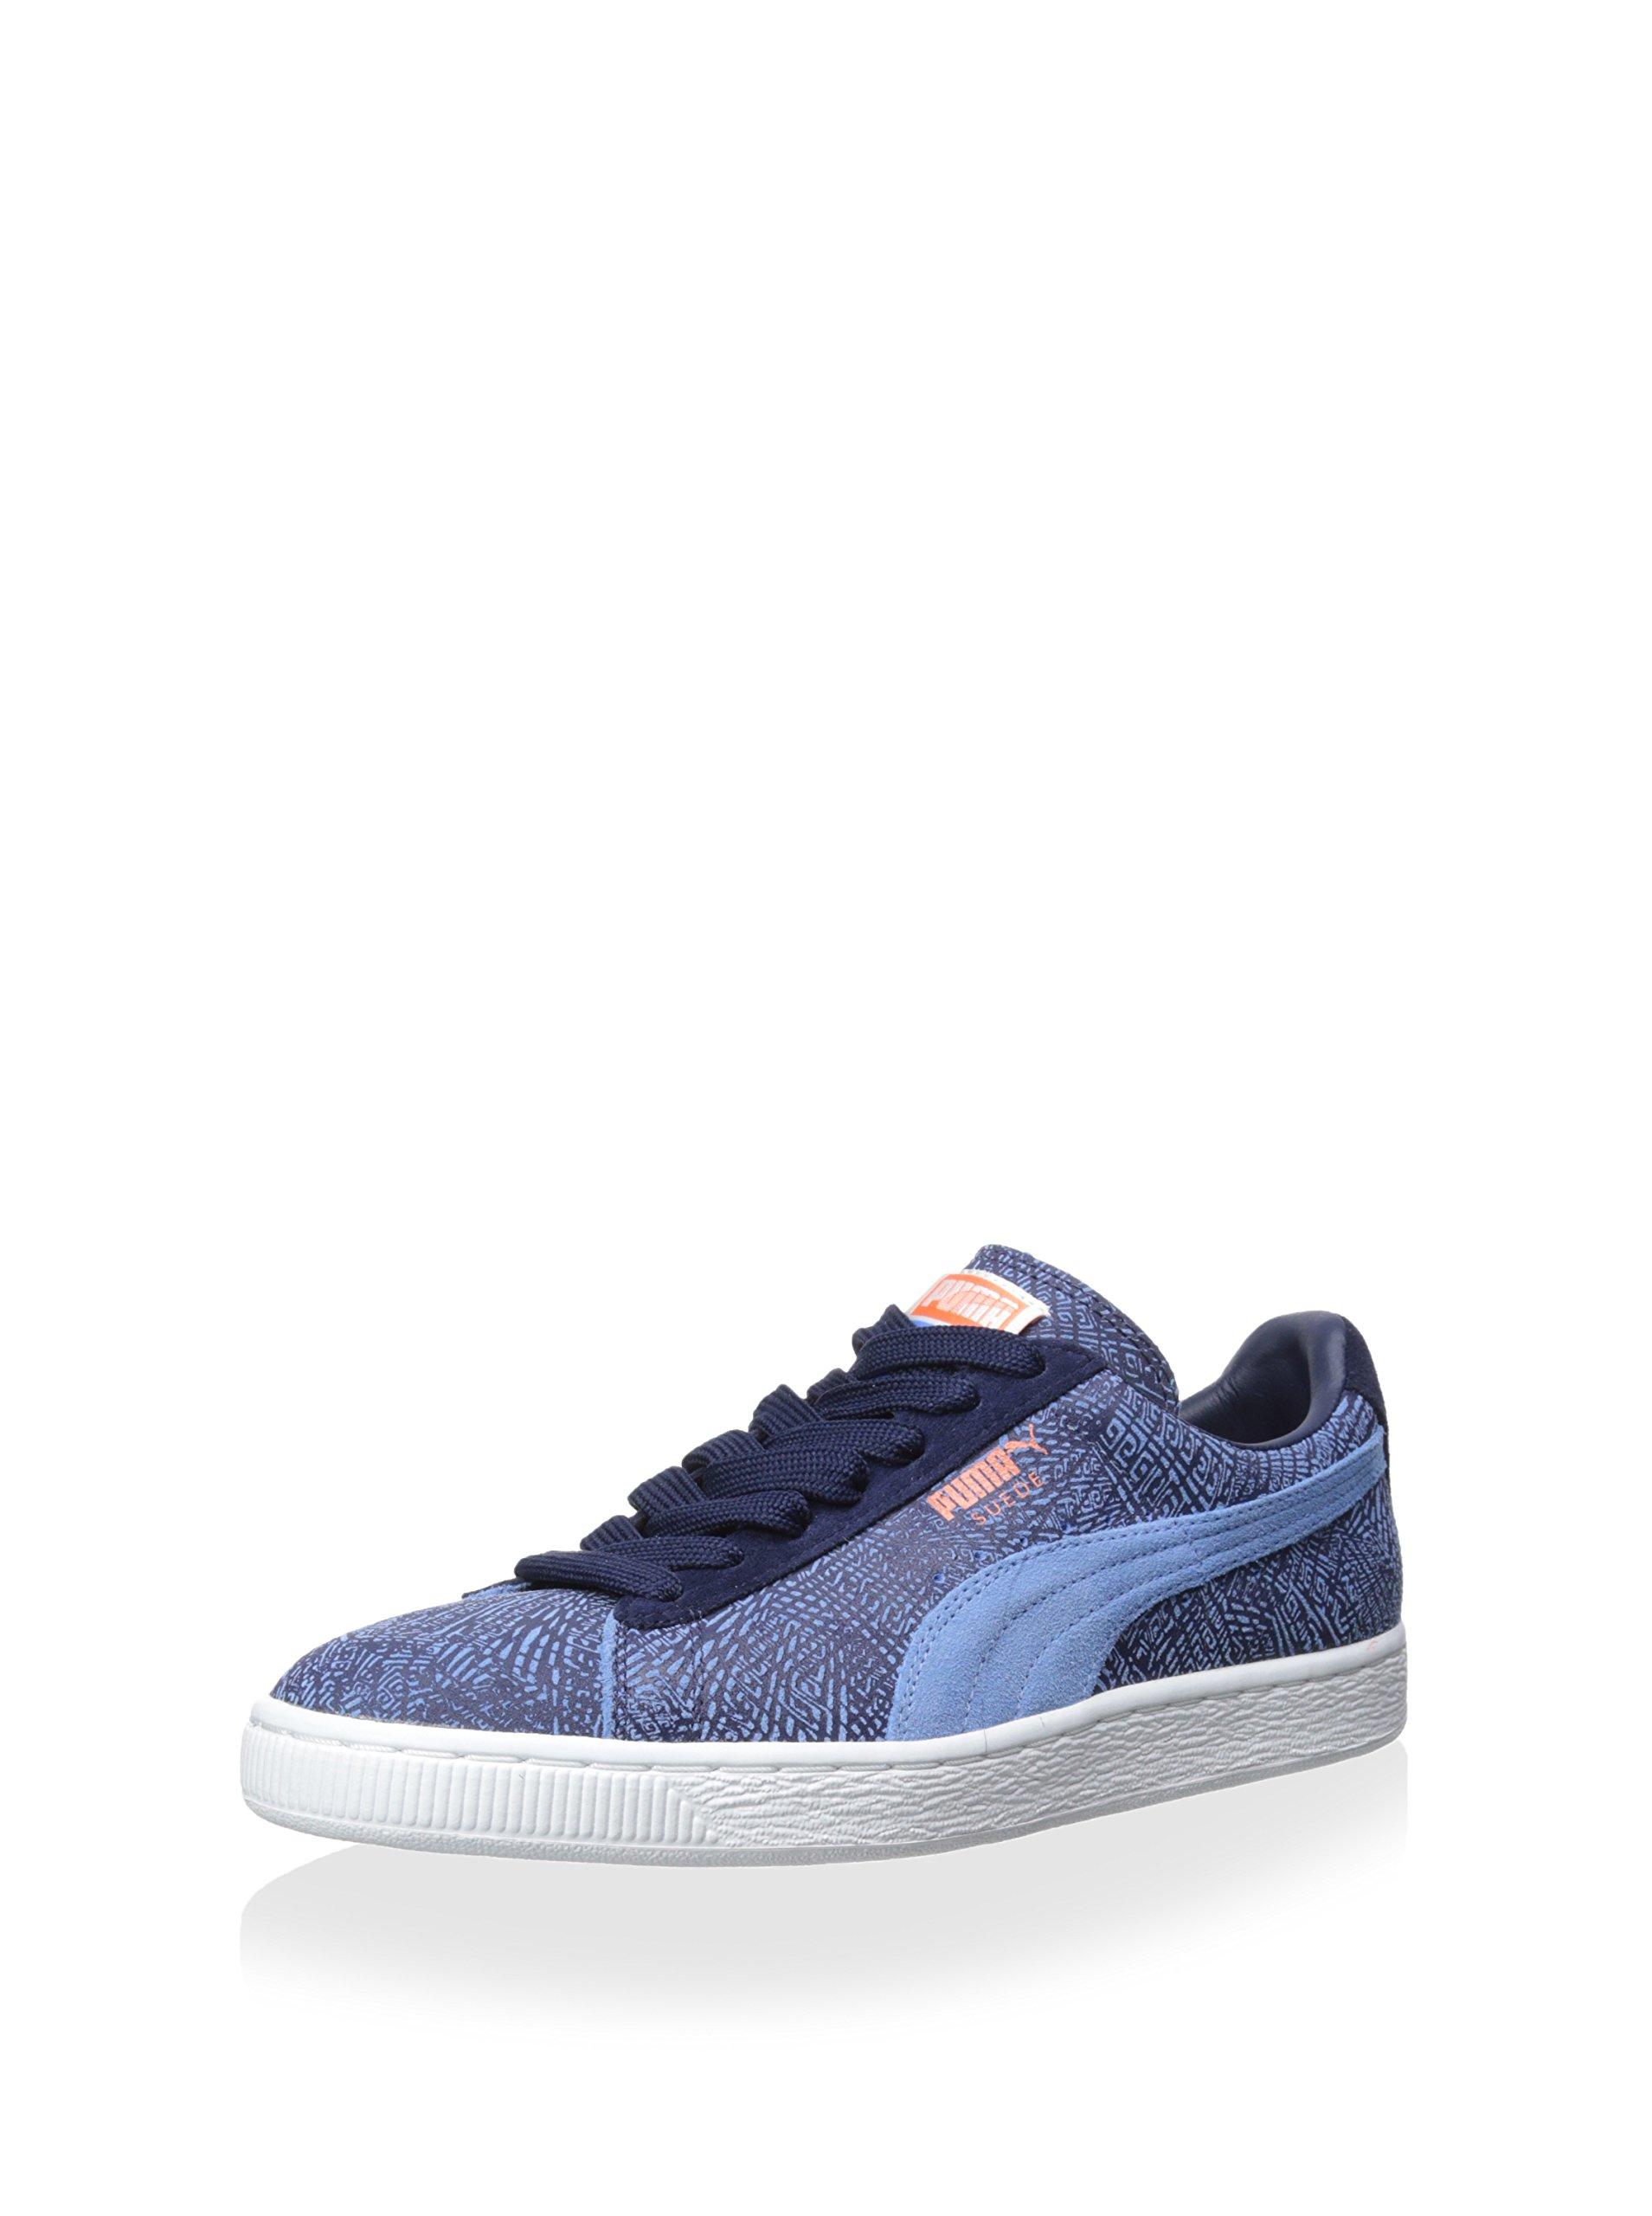 Puma Suede Mis-Match Suede Sneakers (11, Little Boy Blue/Peacoat/Blue)